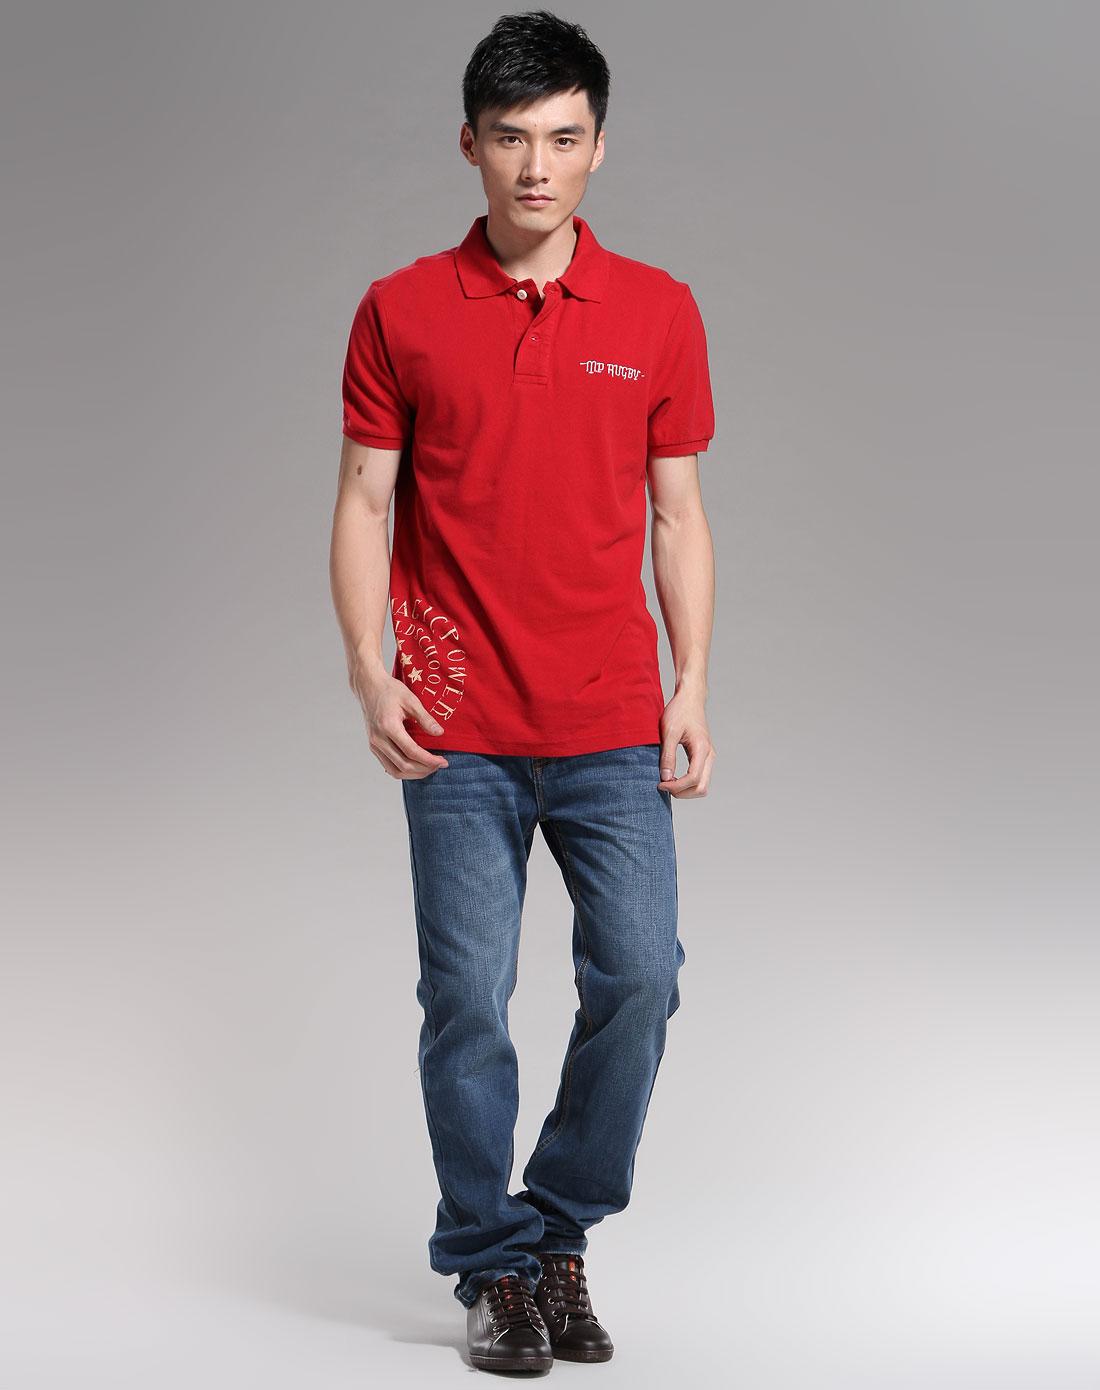 magic power男装专场-红色休闲短袖t恤